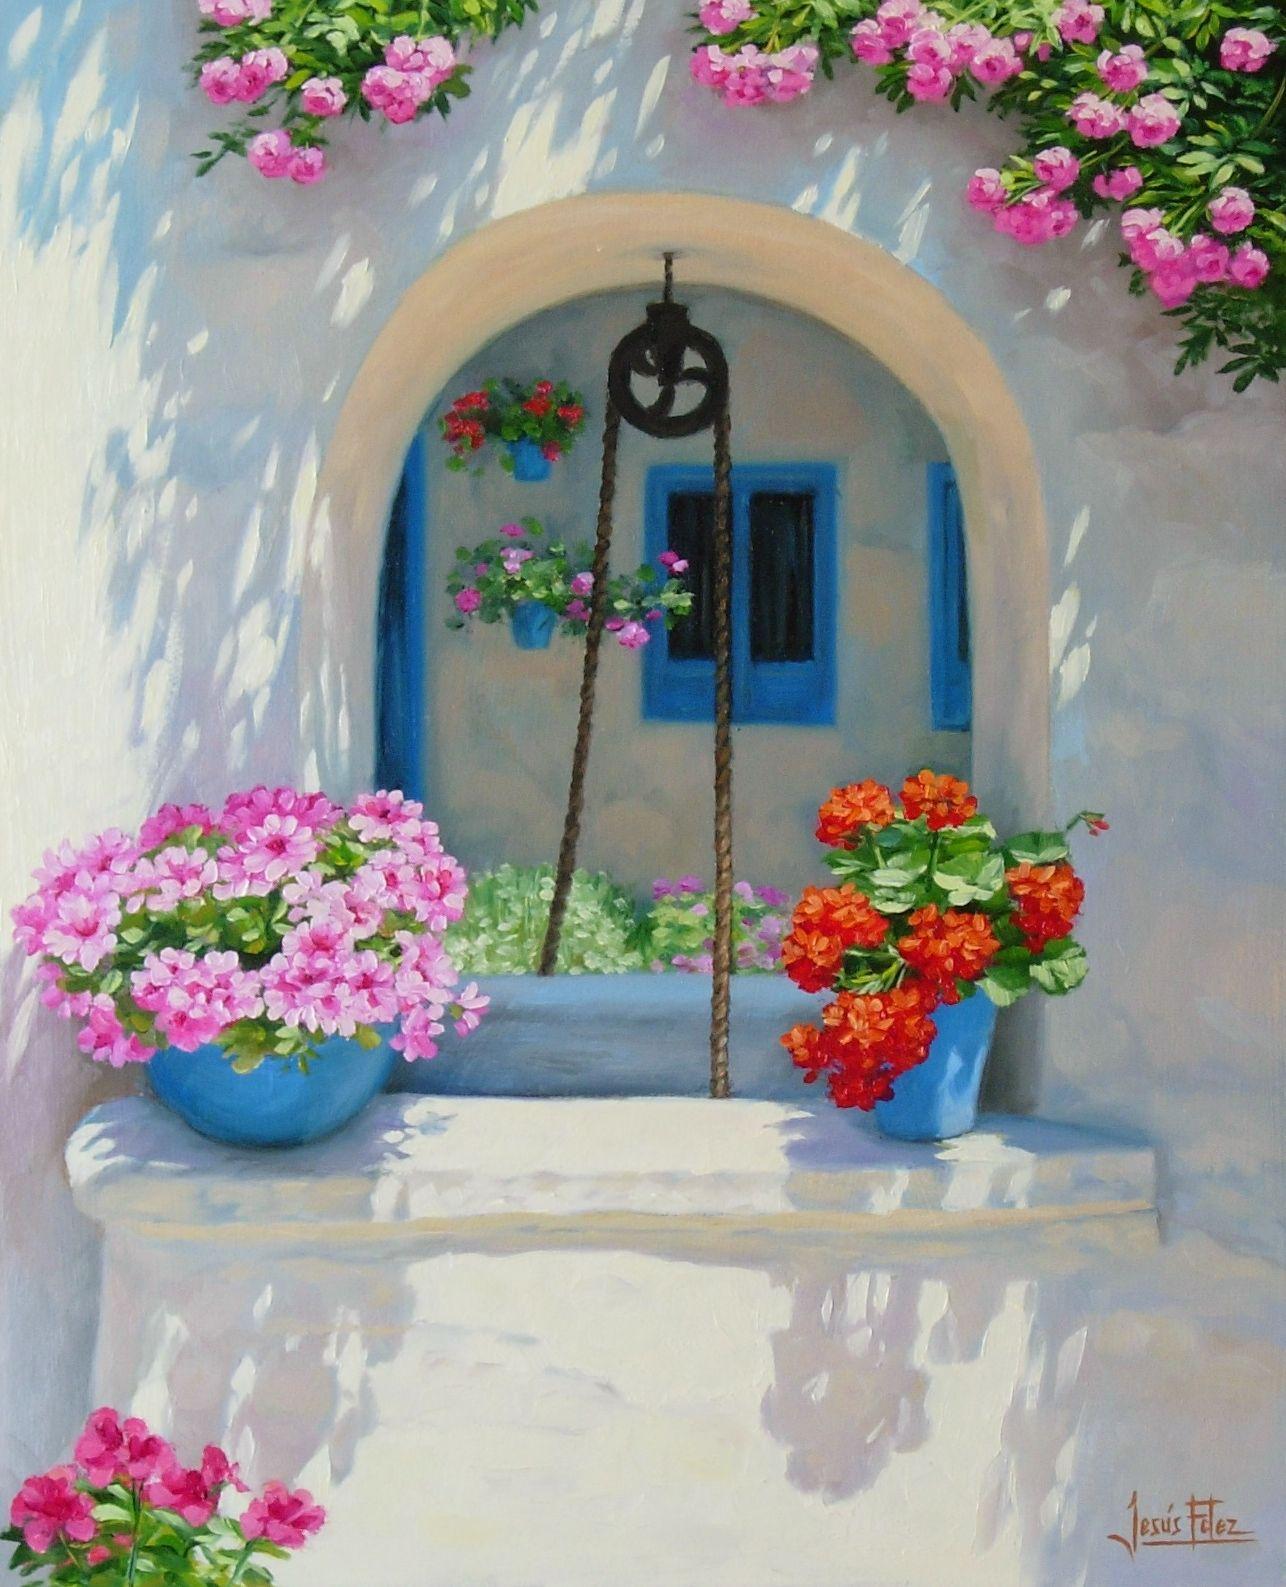 Jesús Fernández Romero Pintura Acrilica Cuadros Pintura Al Oleo Paisajes Pinturas Florales